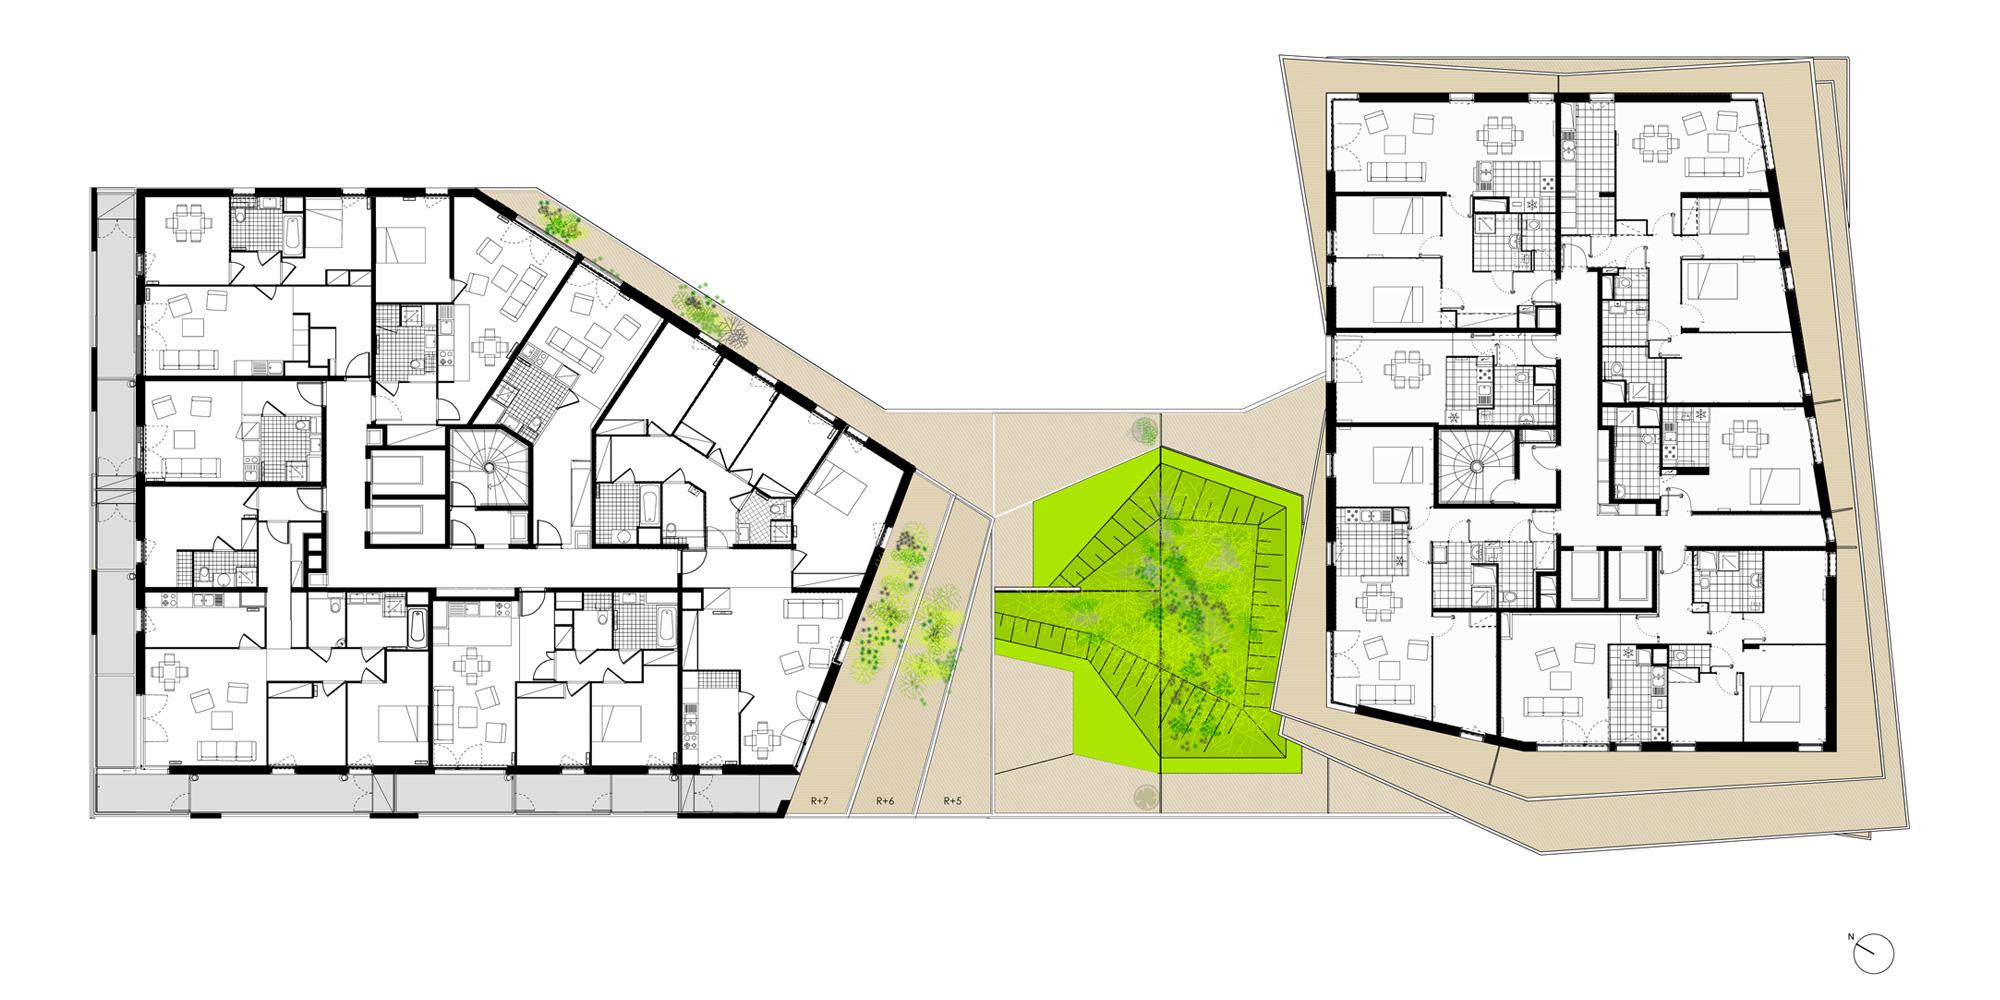 7th Floor Plan © Hamonic+Masson & Associés